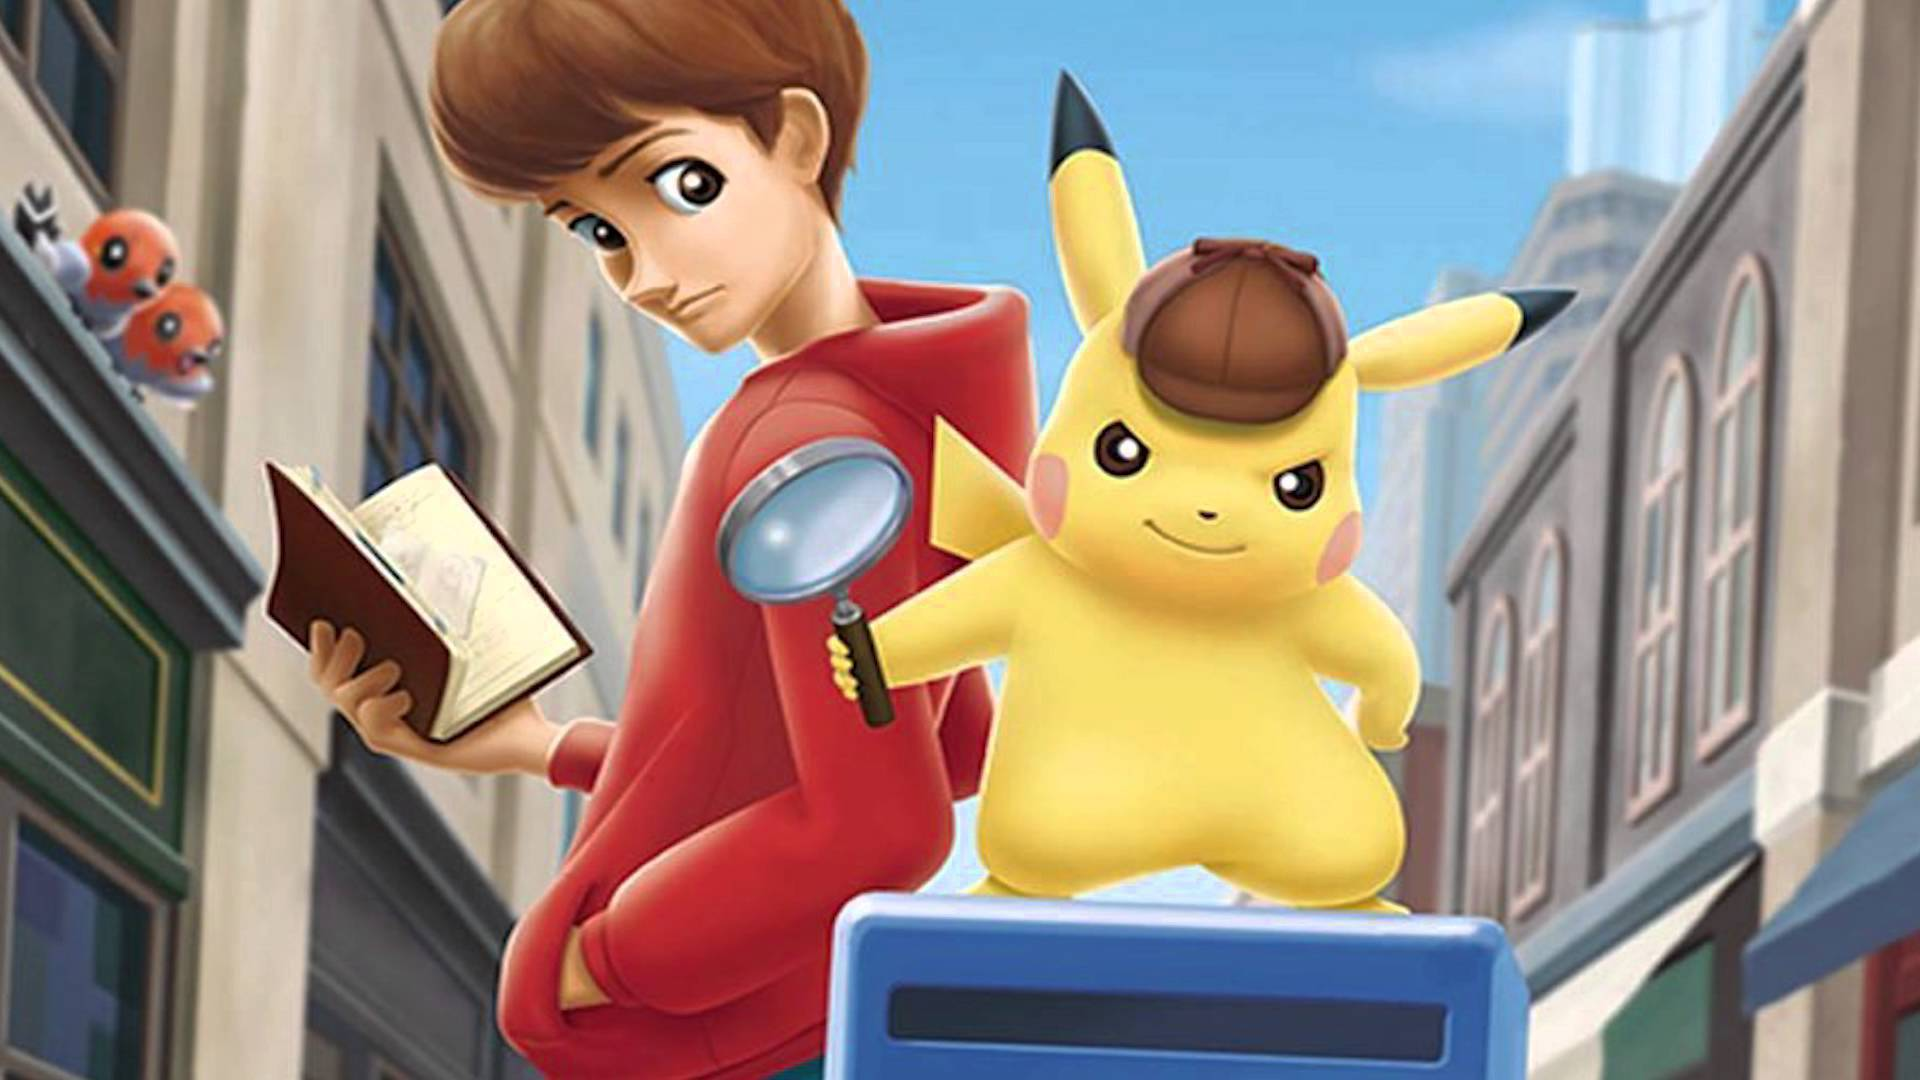 Ryan Reynolds interpretará a Pikachu en película live-action